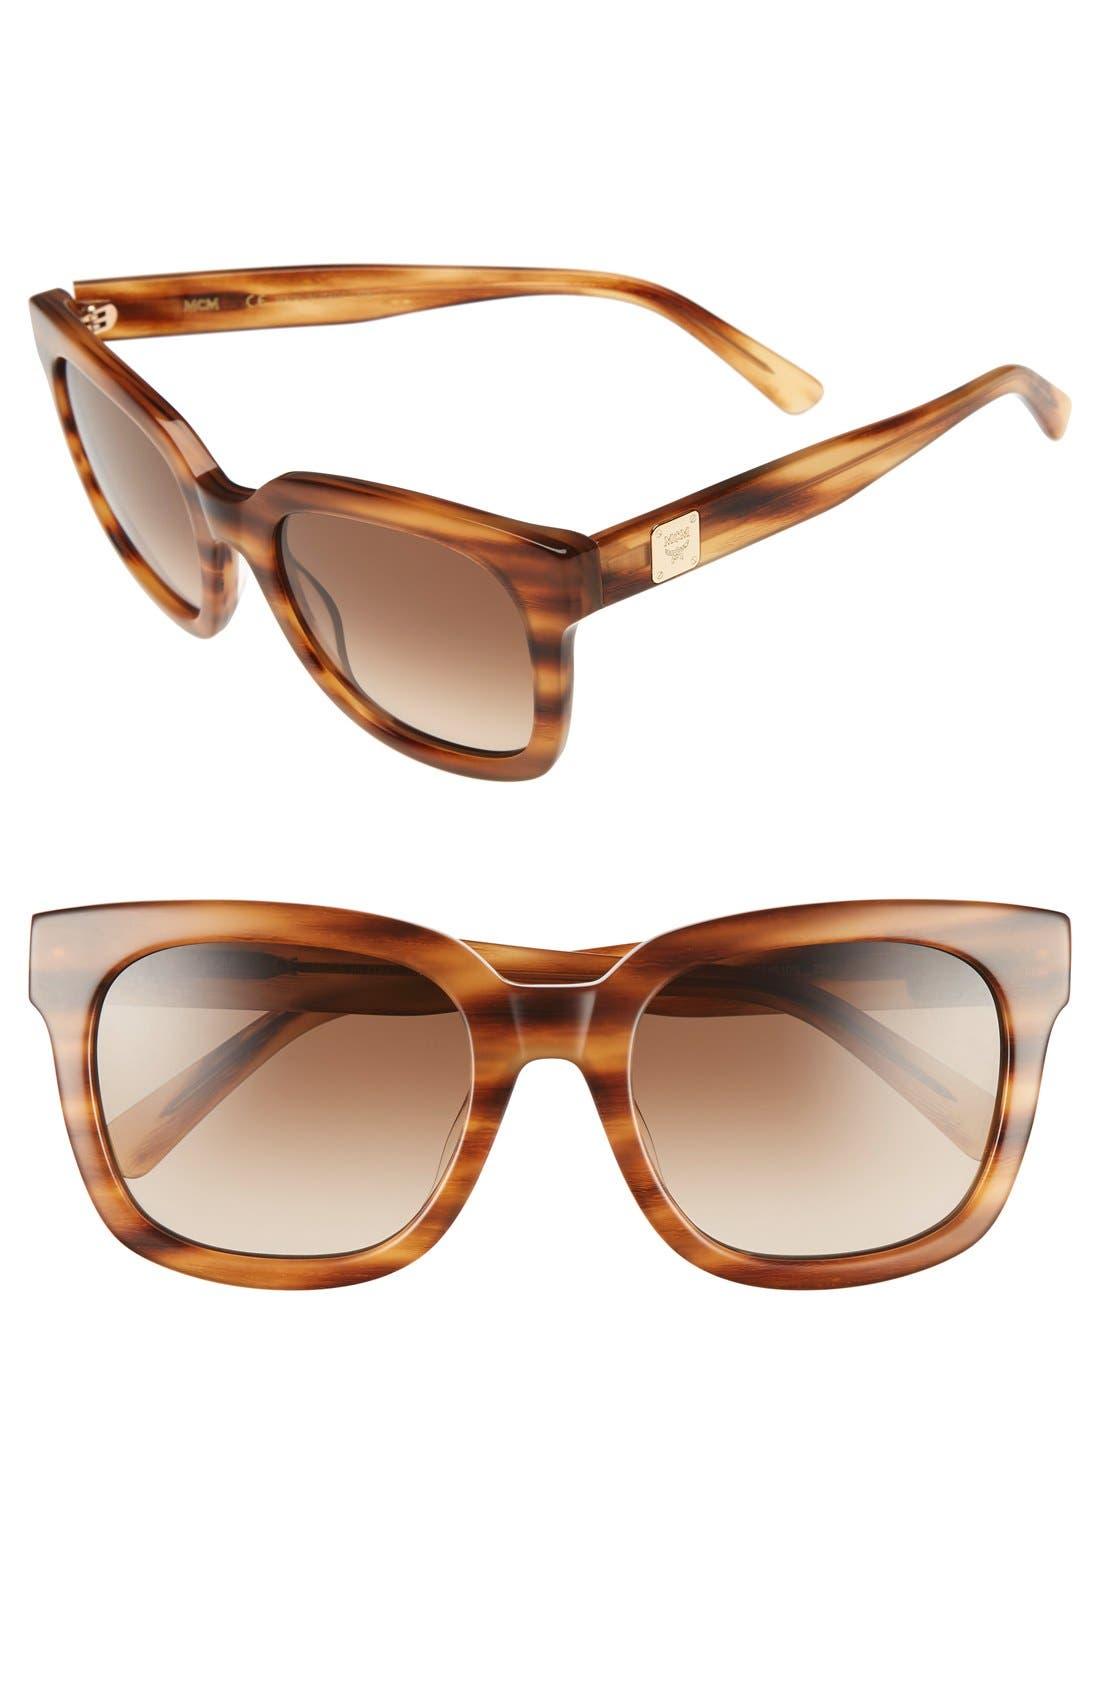 Alternate Image 1 Selected - MCM 54mm Retro Sunglasses